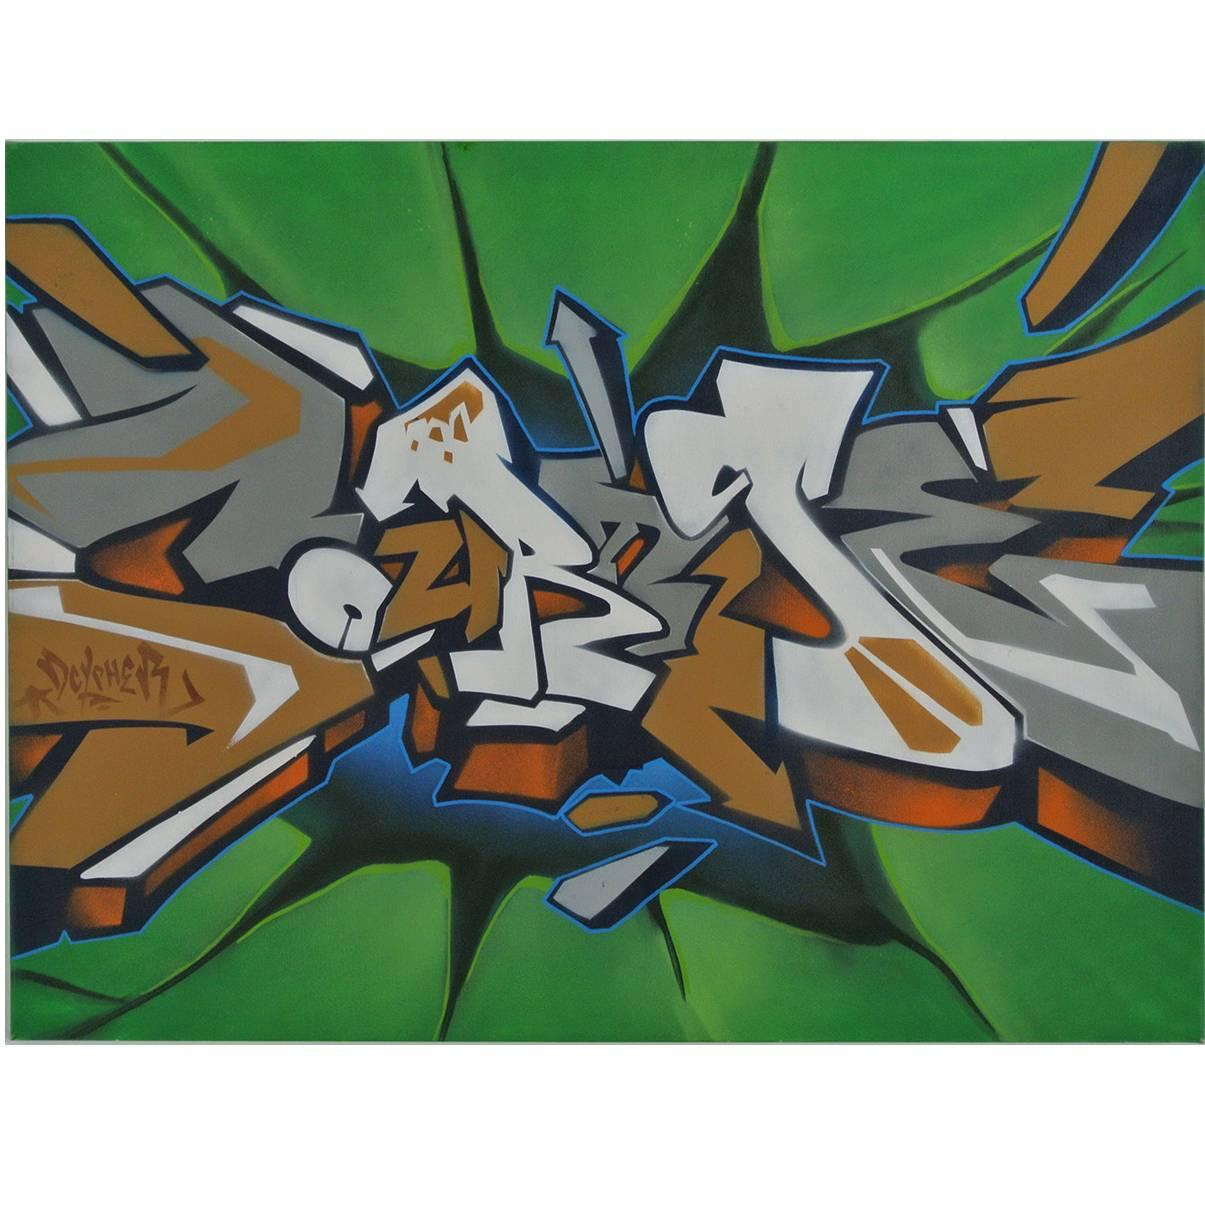 Southern California Graffiti Artist, Acrylic on canvas painting